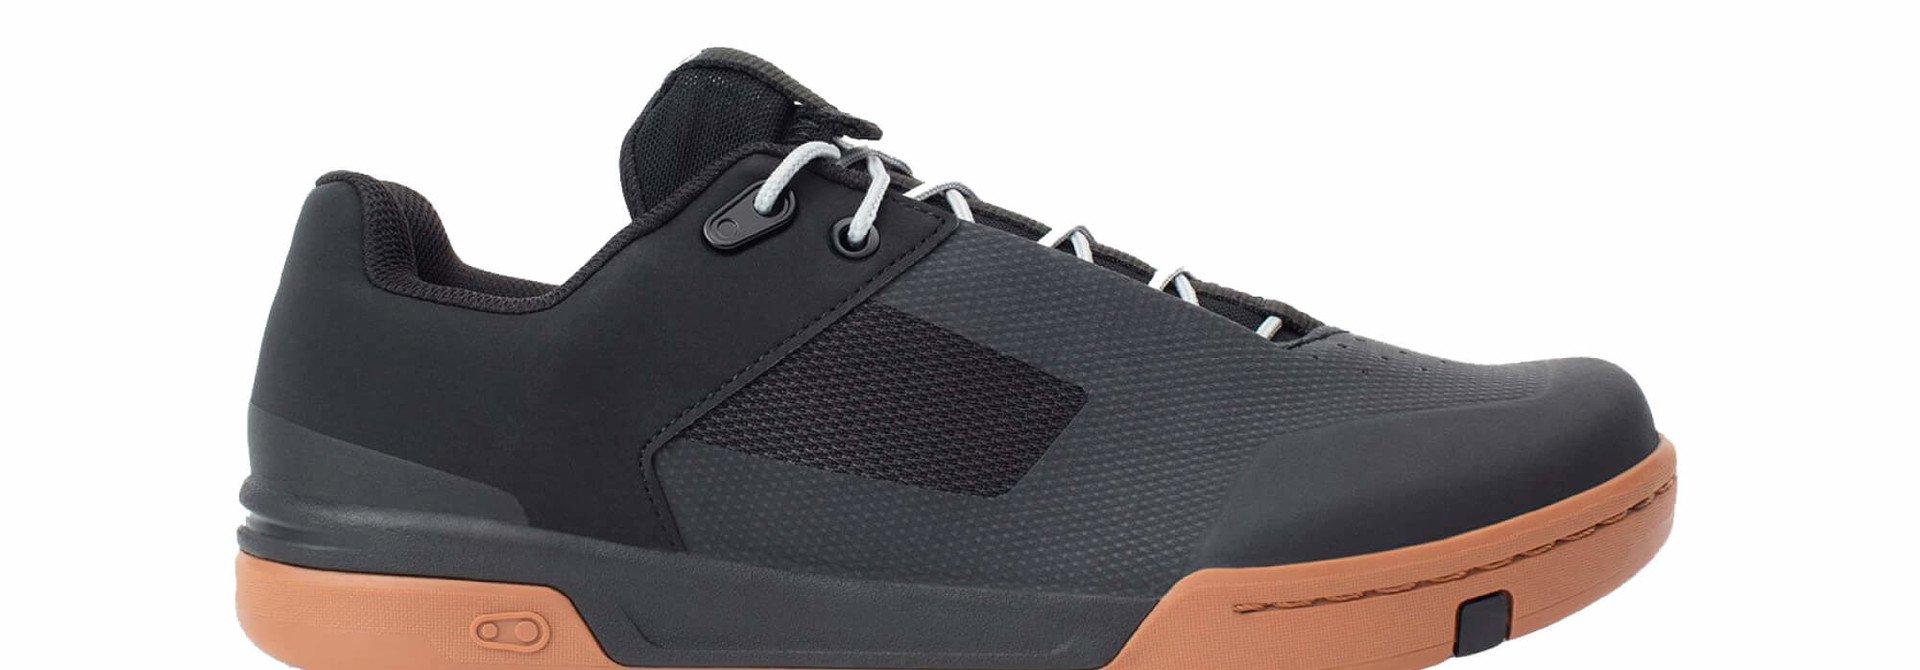 Shoe Stamp Lace Flat